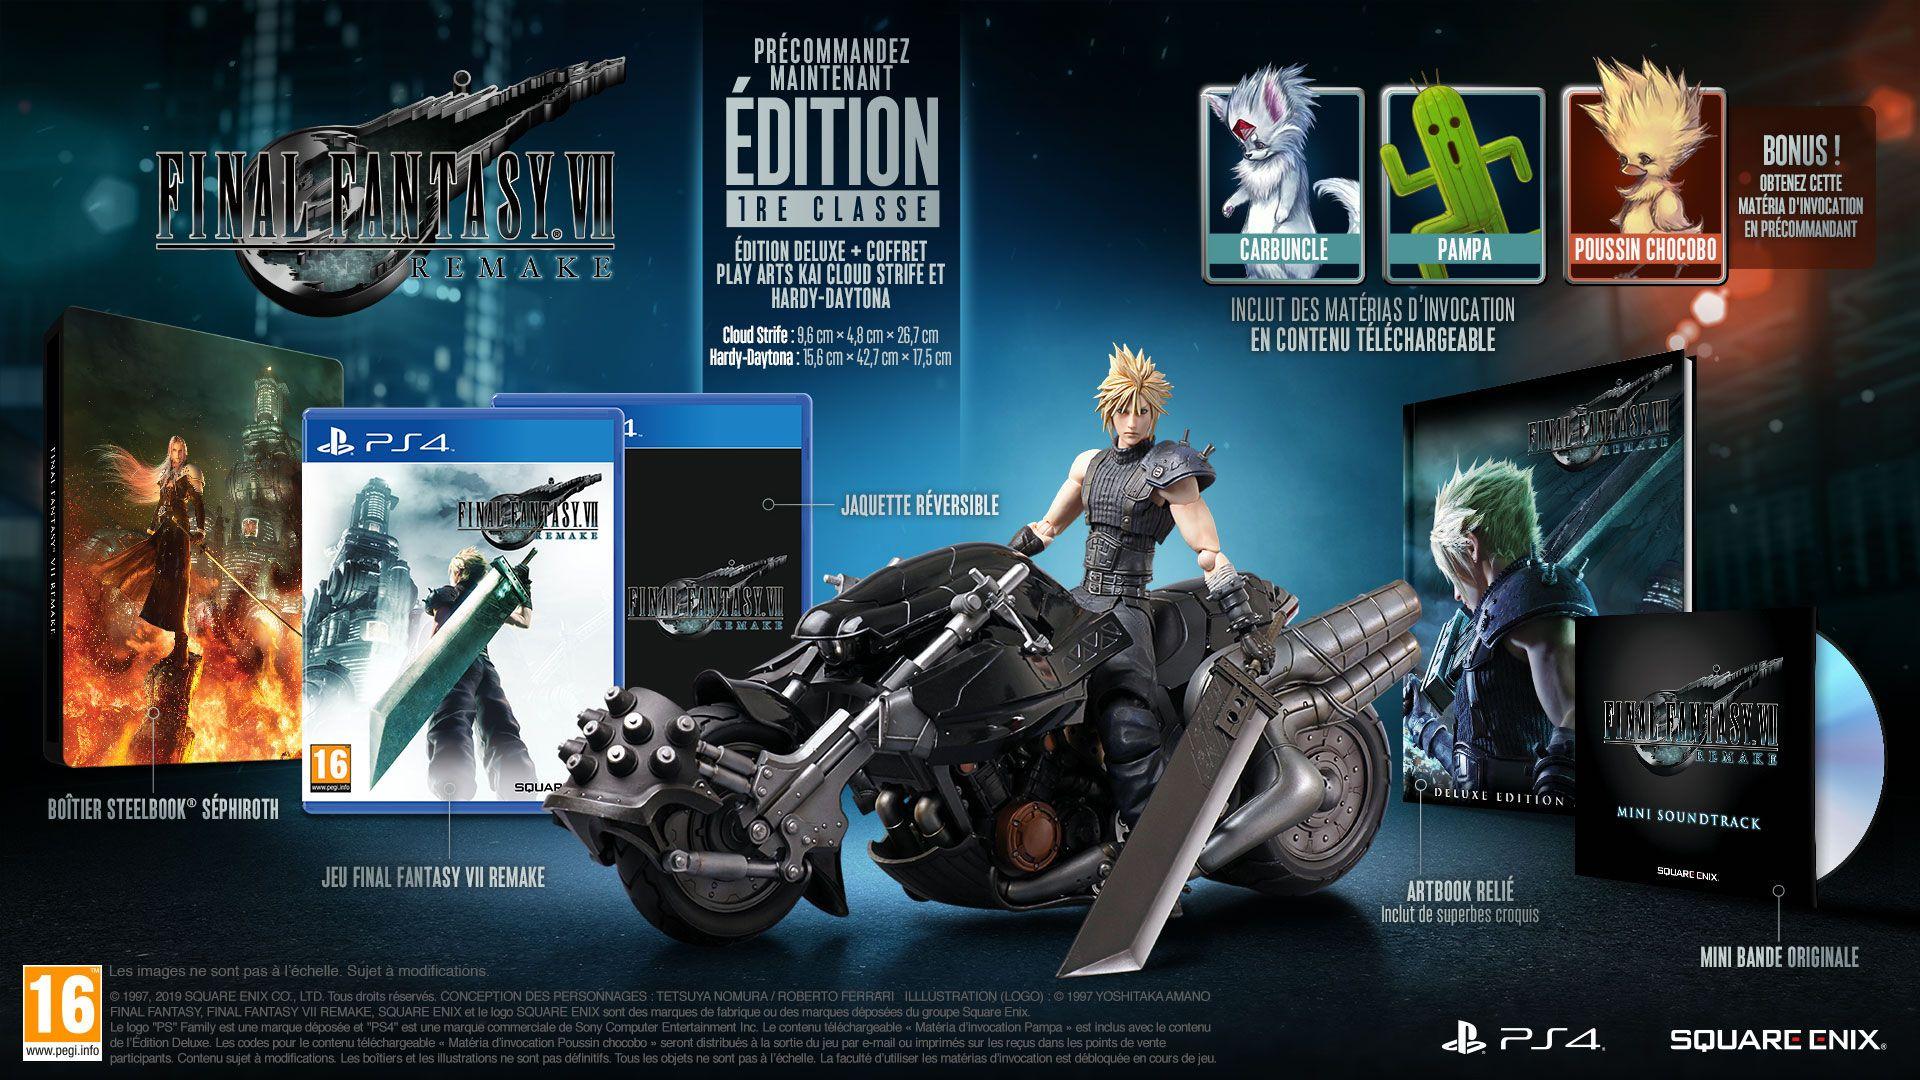 Final Fantasy VII Remake Collector